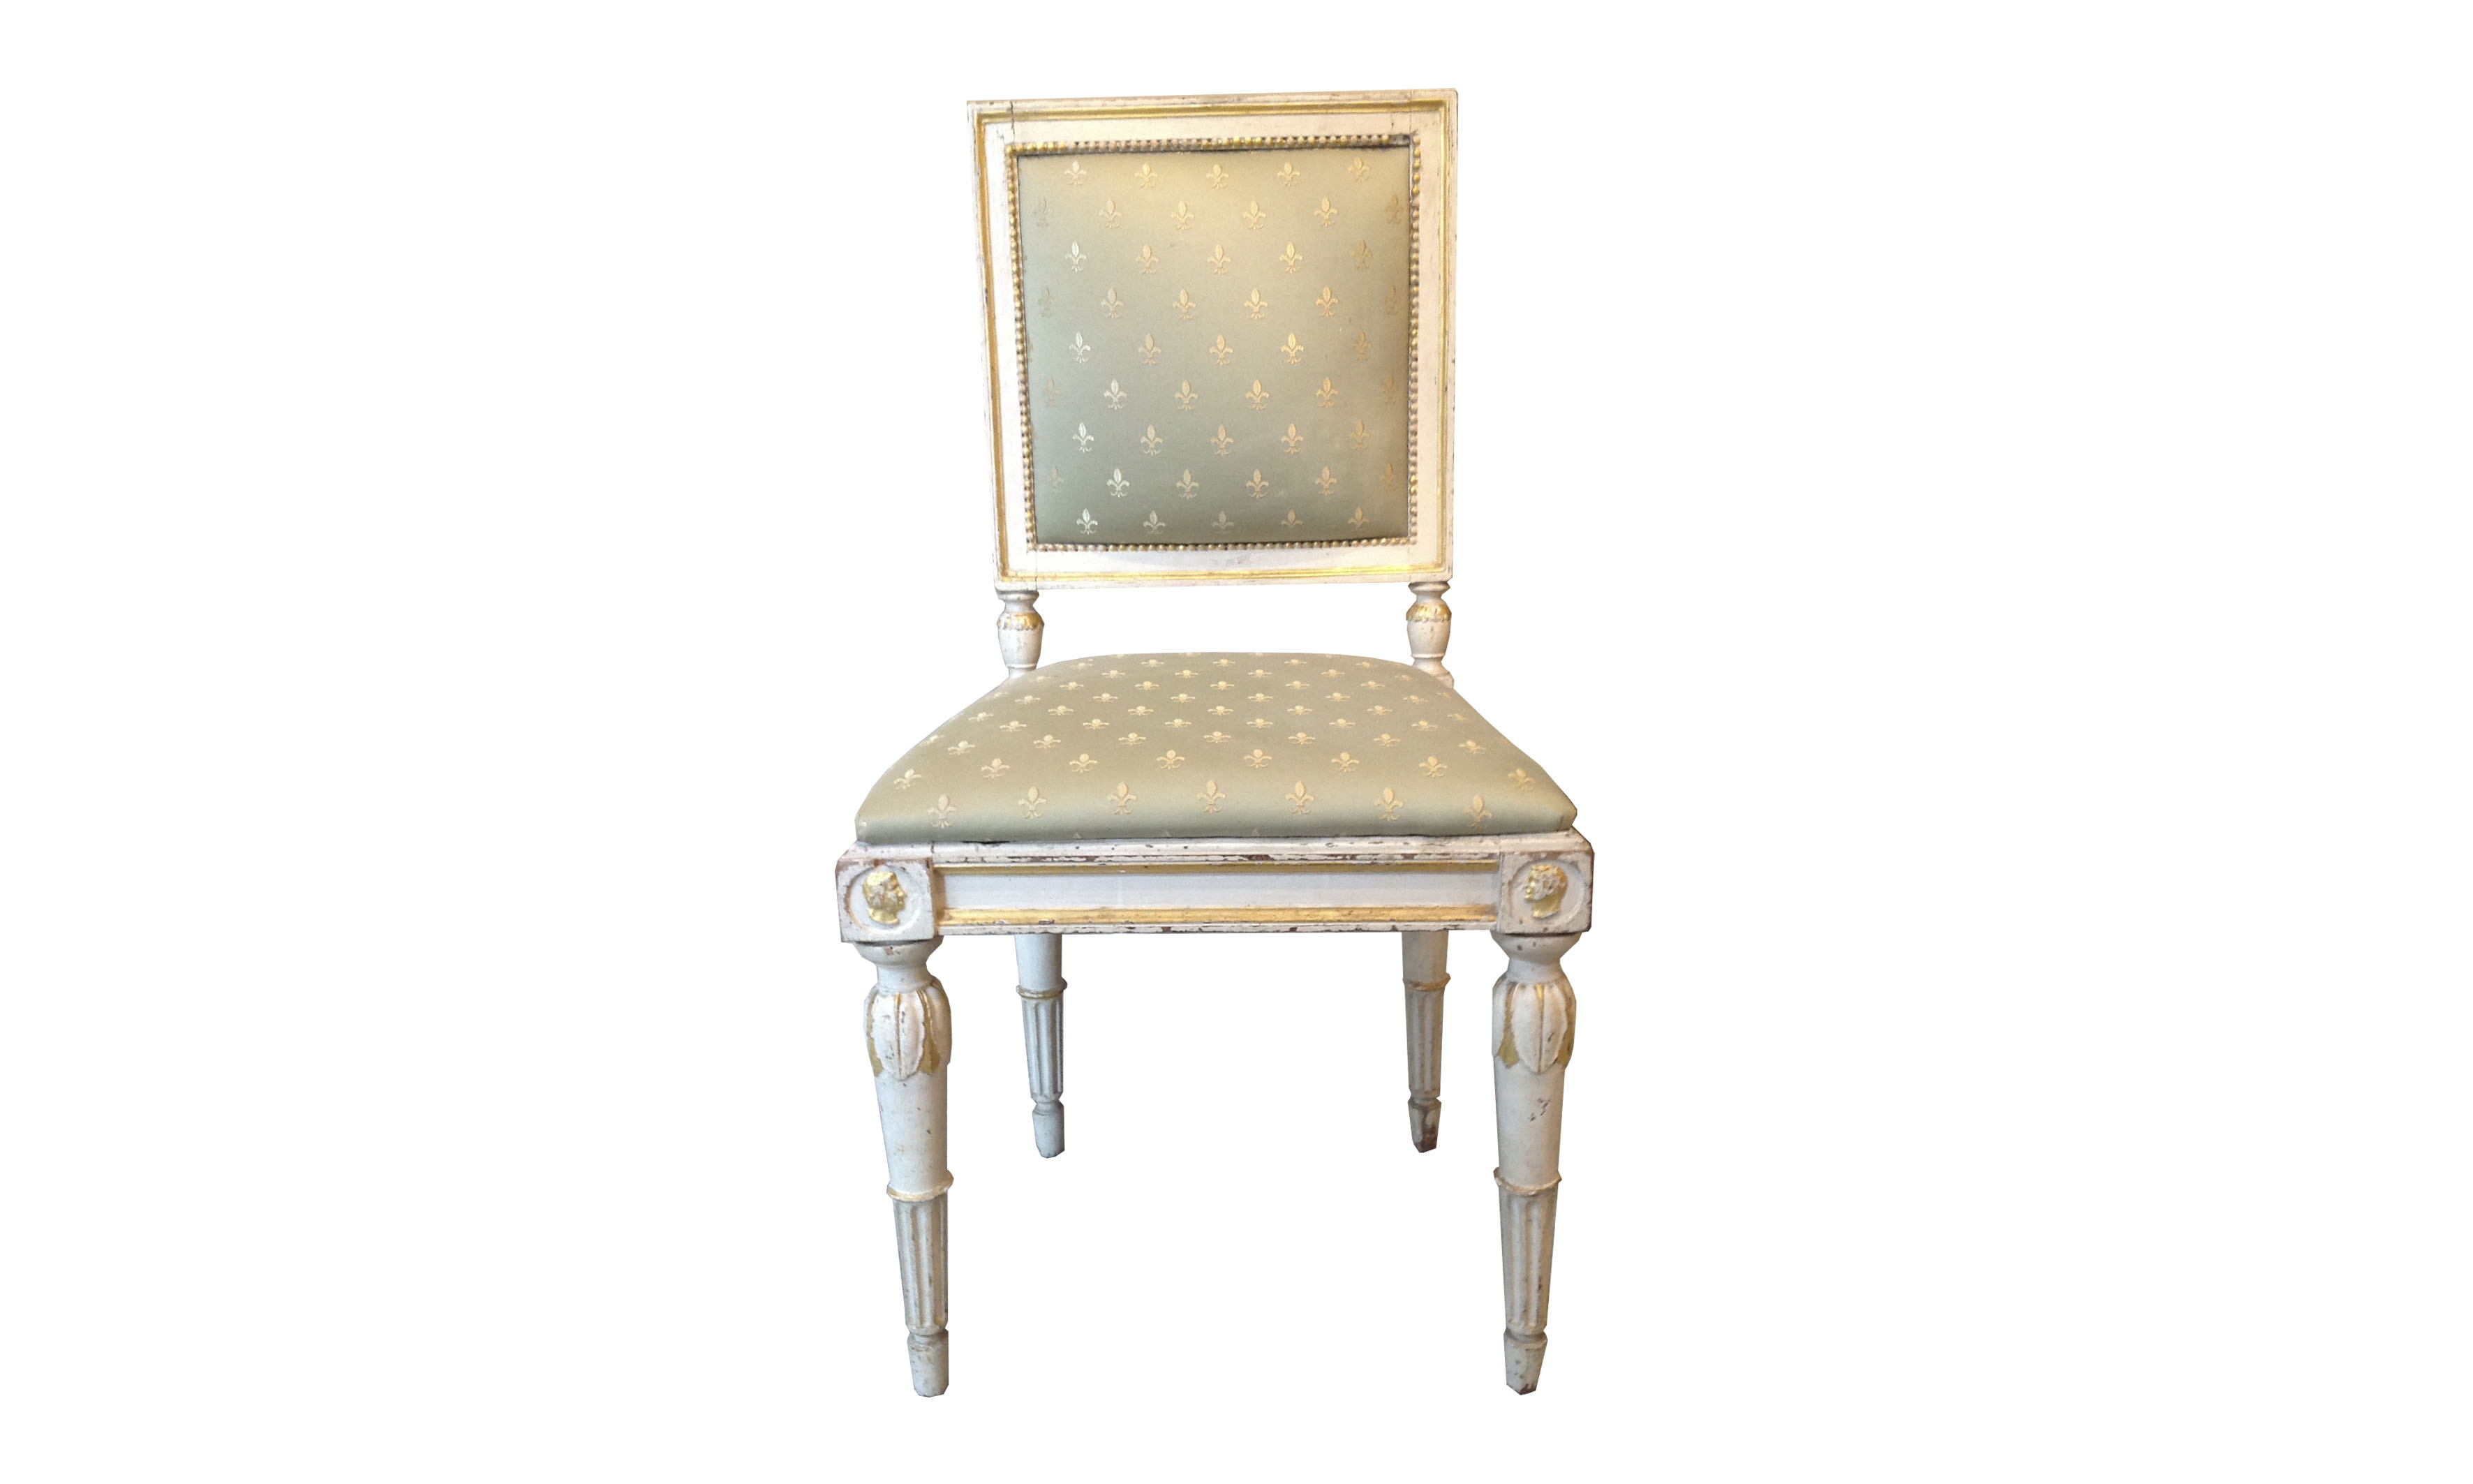 Sedie In Legno Laccate Bianco.Quattro Sedie In Legno Laccato Bianco Antiquariato Da Collezione